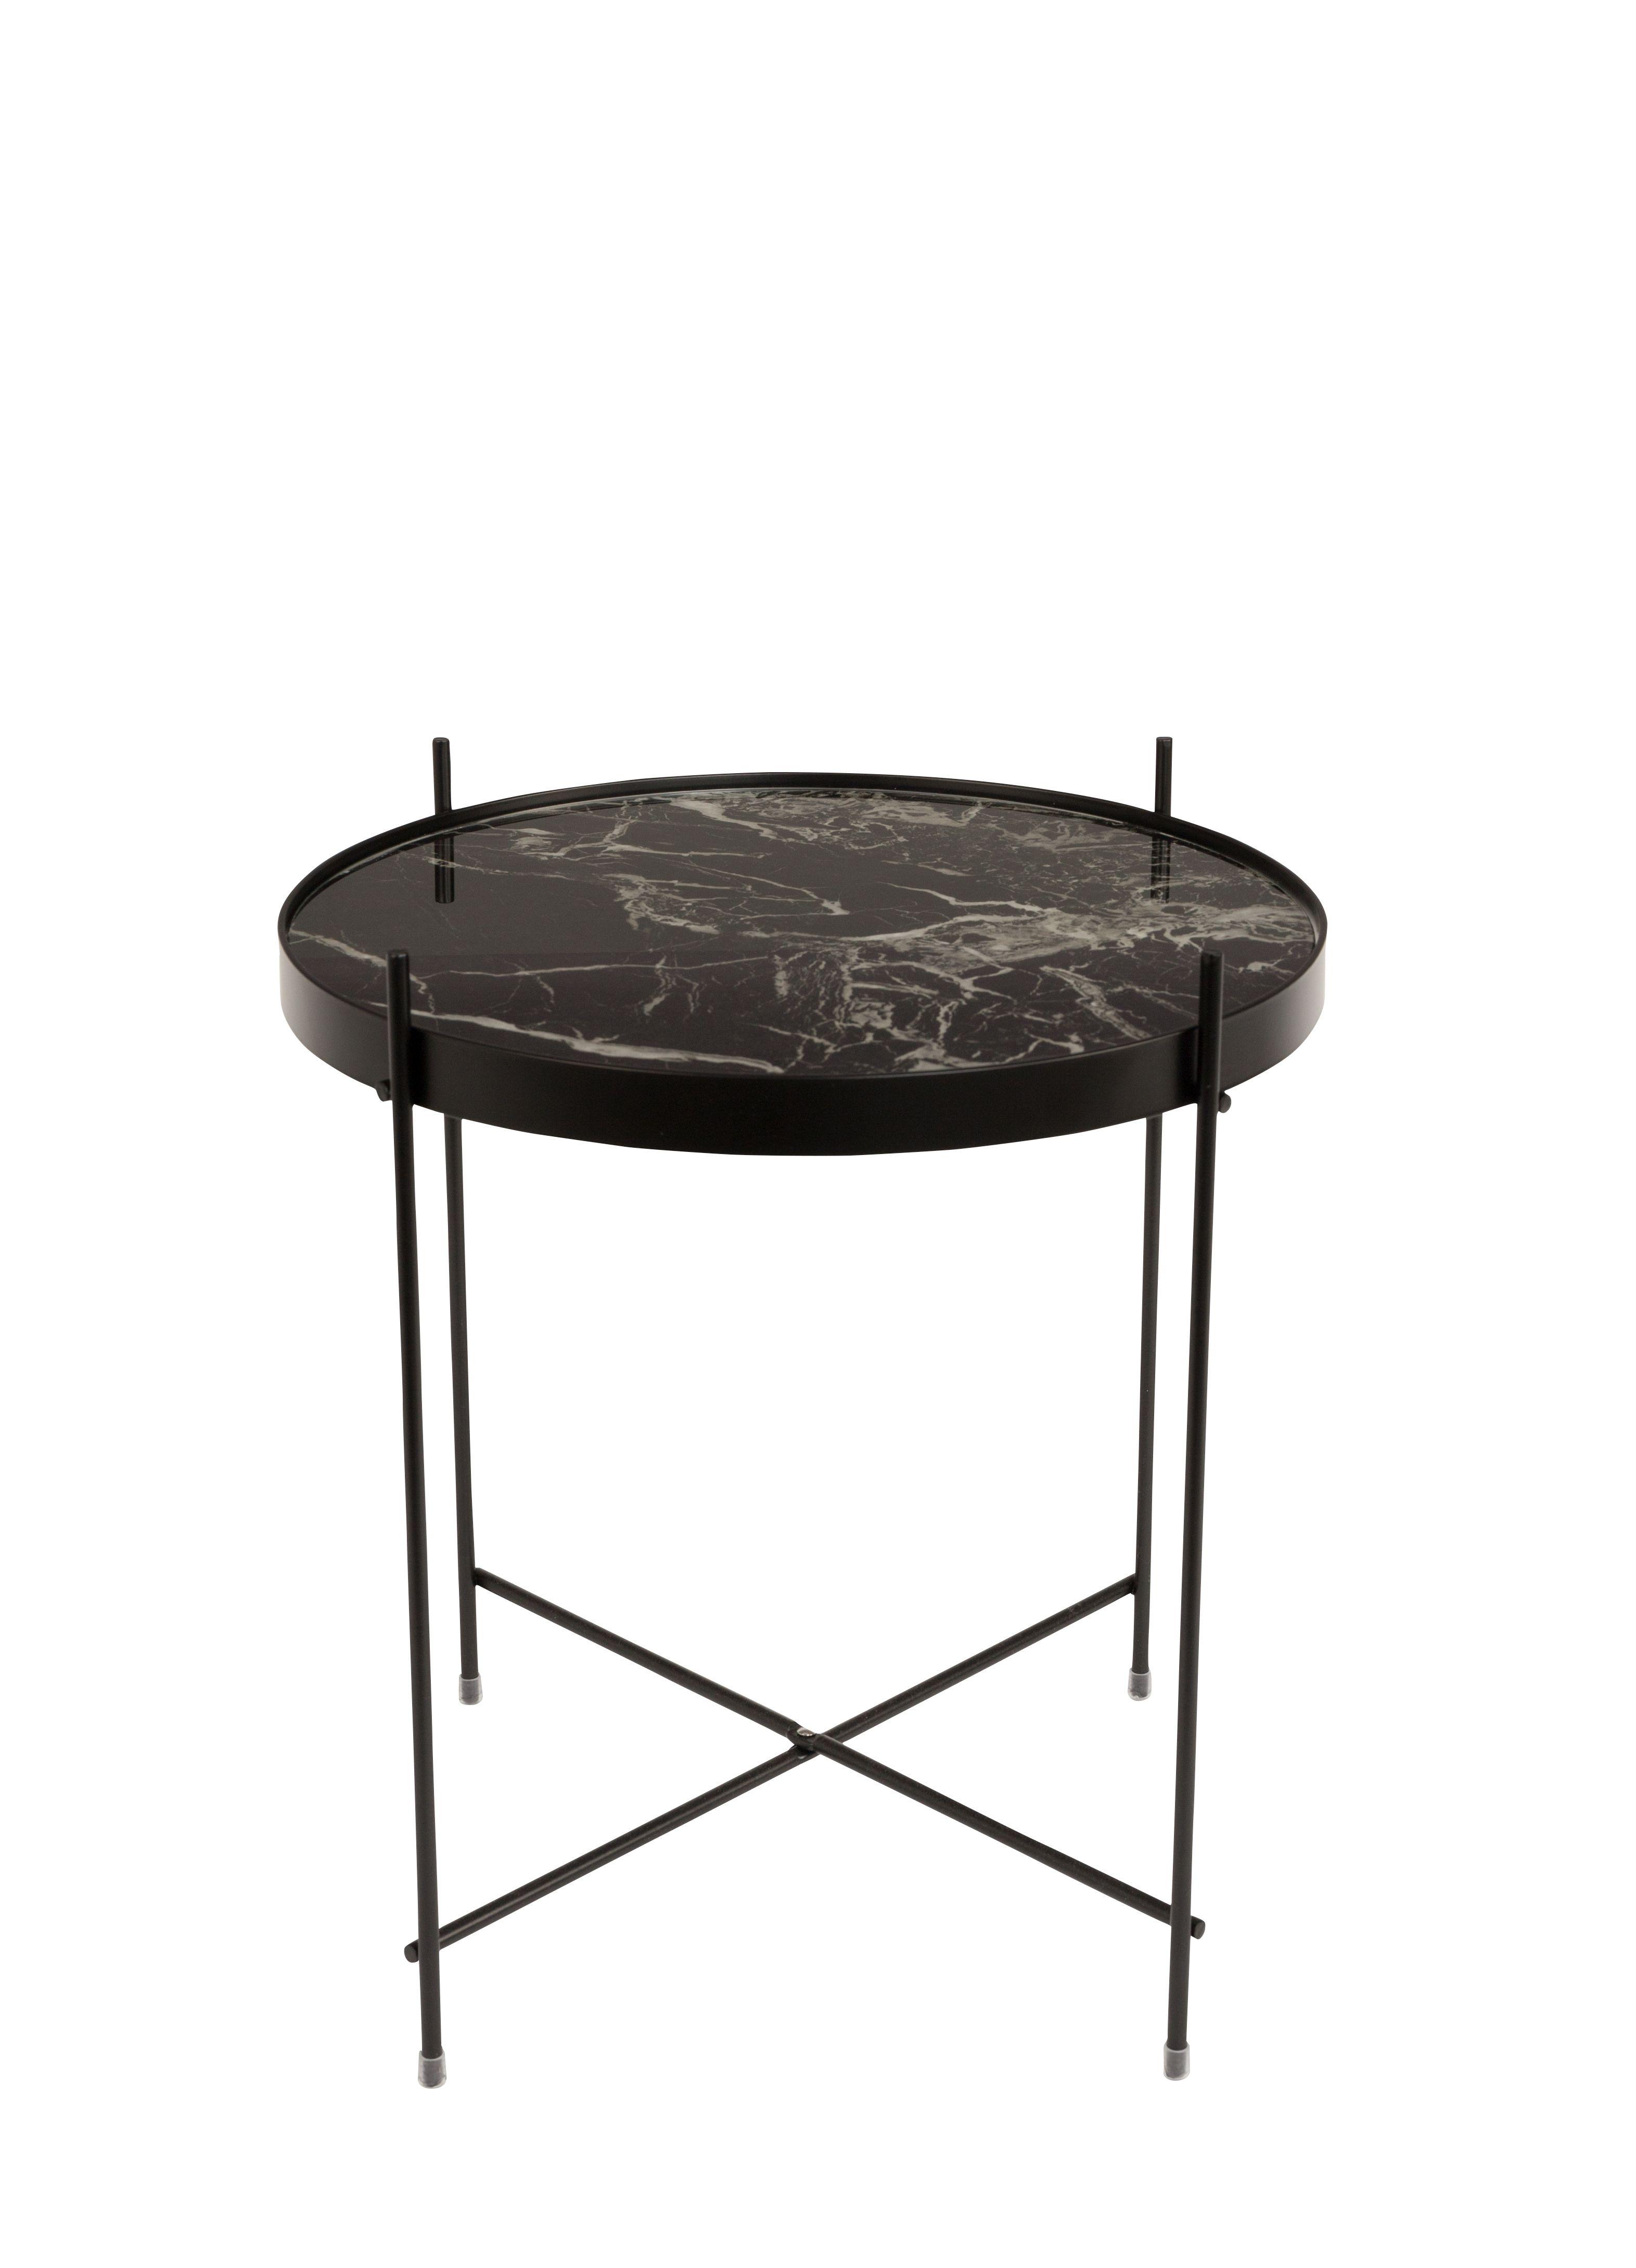 Side Table Bijzettafel.Stolik Cupid Oxon Czarny Marmur 43 Cm Zuiver Lazienka In